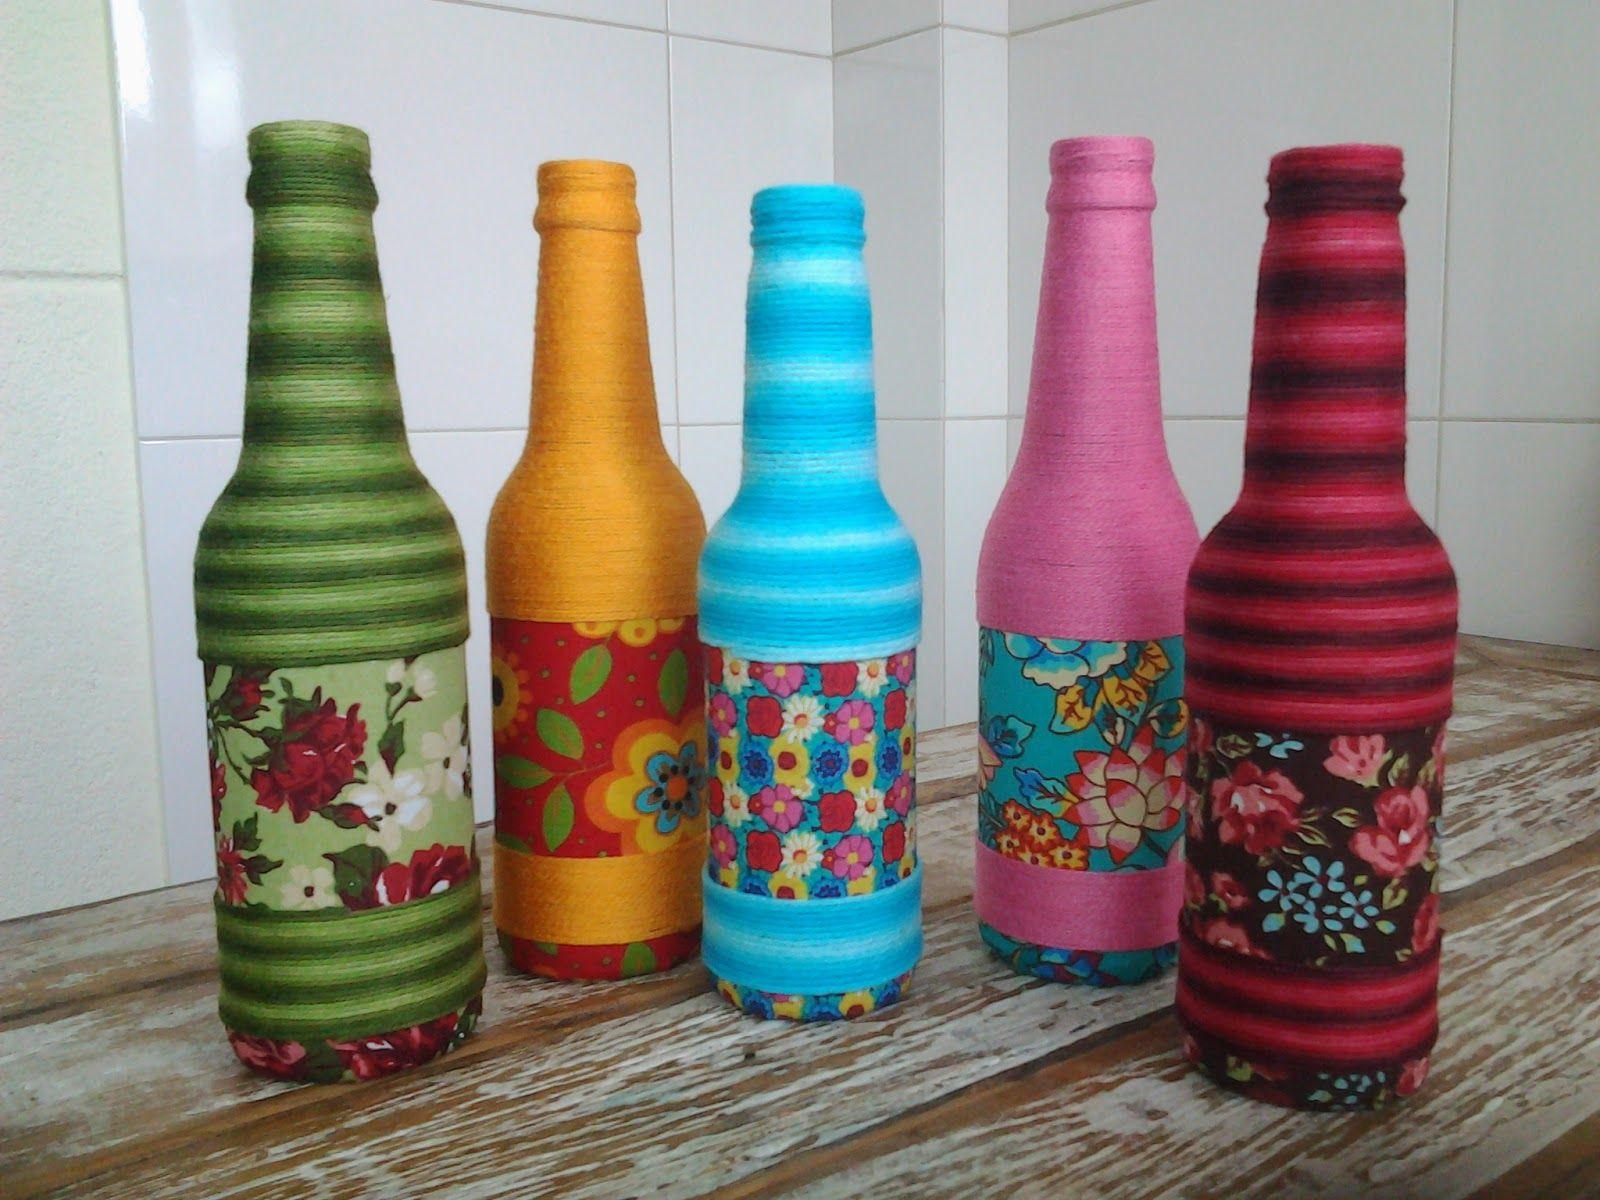 Armario Metalico Garaje ~ garrafas decoradas Pesquisa Google Artesanato Pinterest Garrafas decoradas, Pesquisa